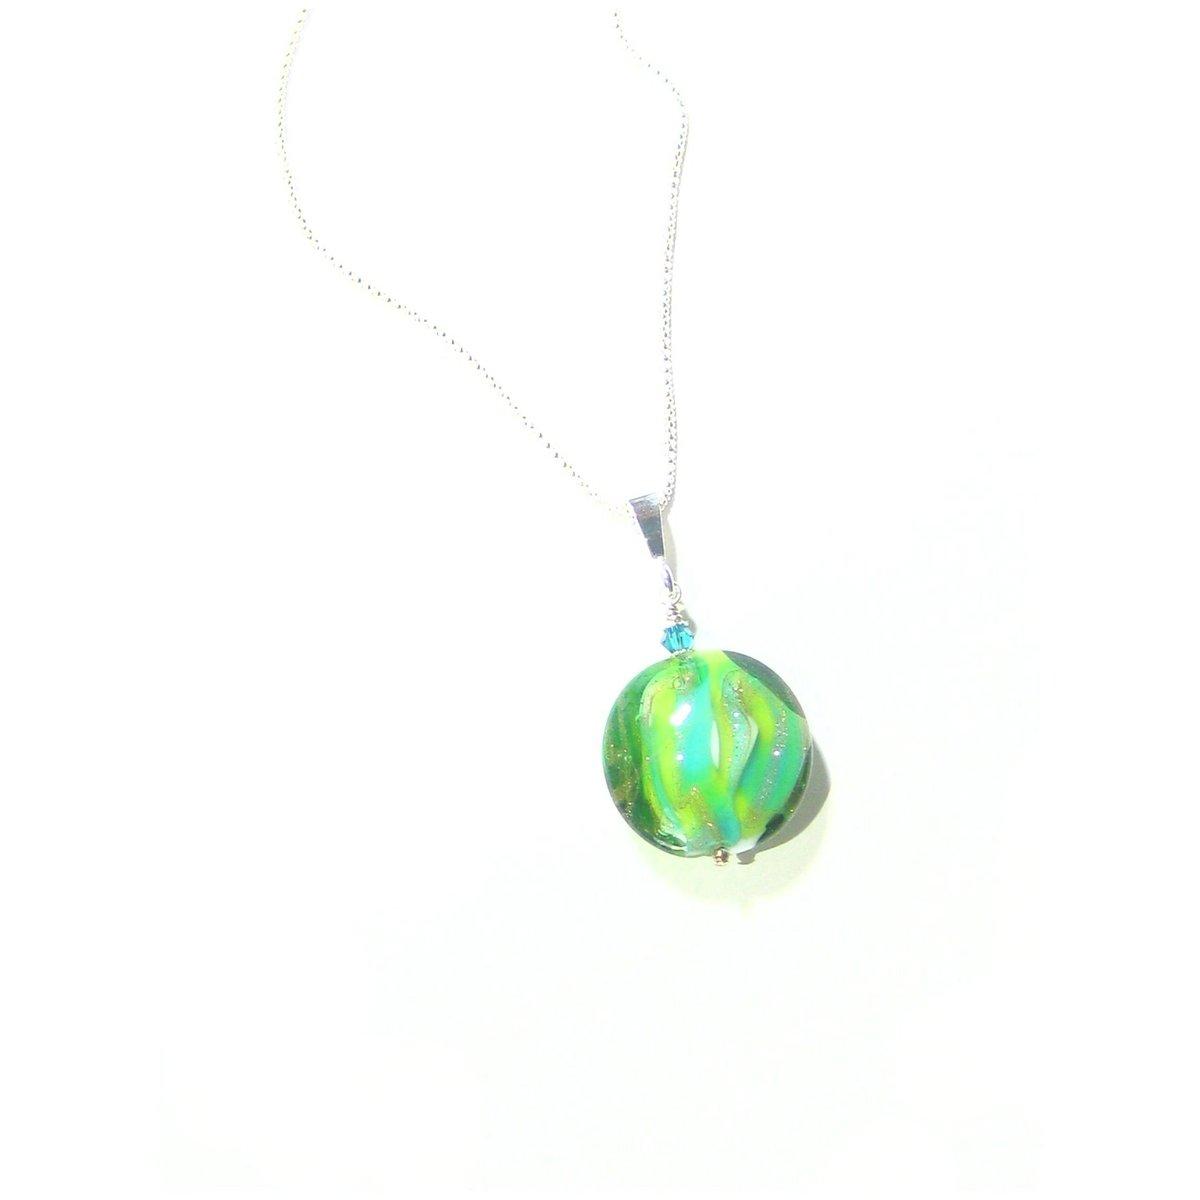 Murano Glass Colorful Green Disc Pendant Necklace, Sterling Silver Italian Chain, 16 Inch, 18 Inch, Gift Idea, 20 Inch Chain  #Murano #jewelryaddict #handmade #Etsymntt #birthdaygift #jewelry